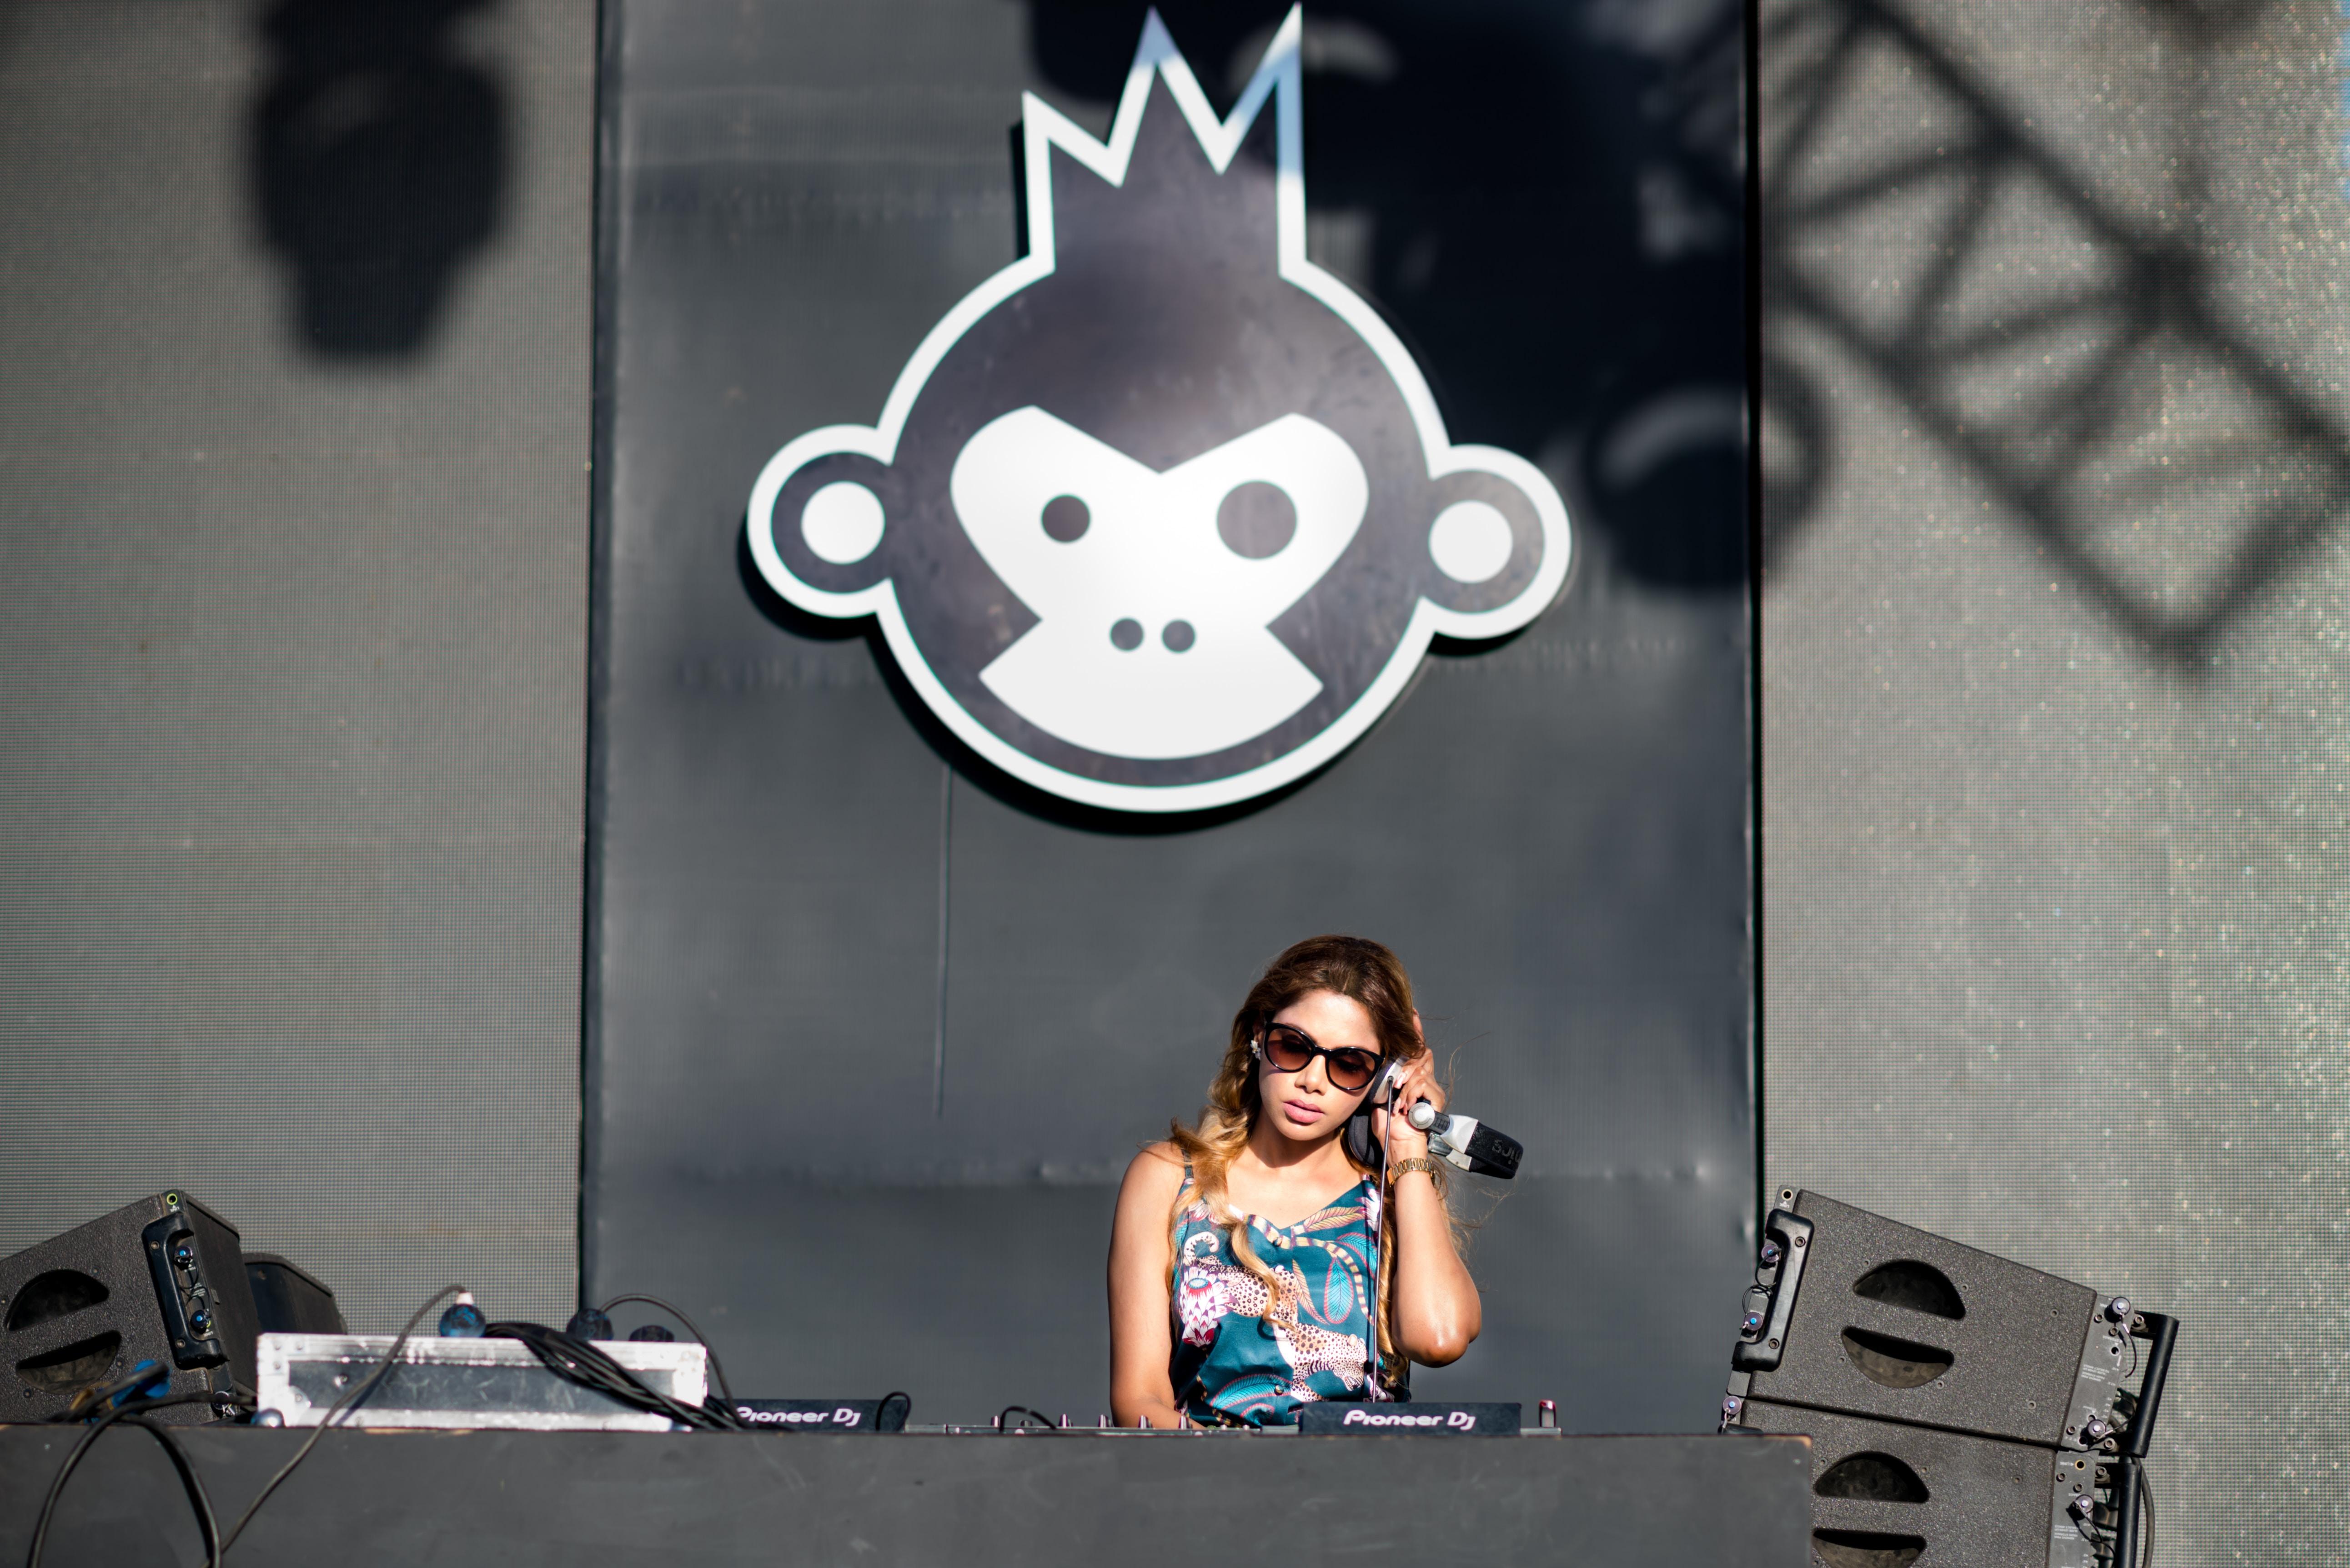 woman standing playing DJ controller during daytime